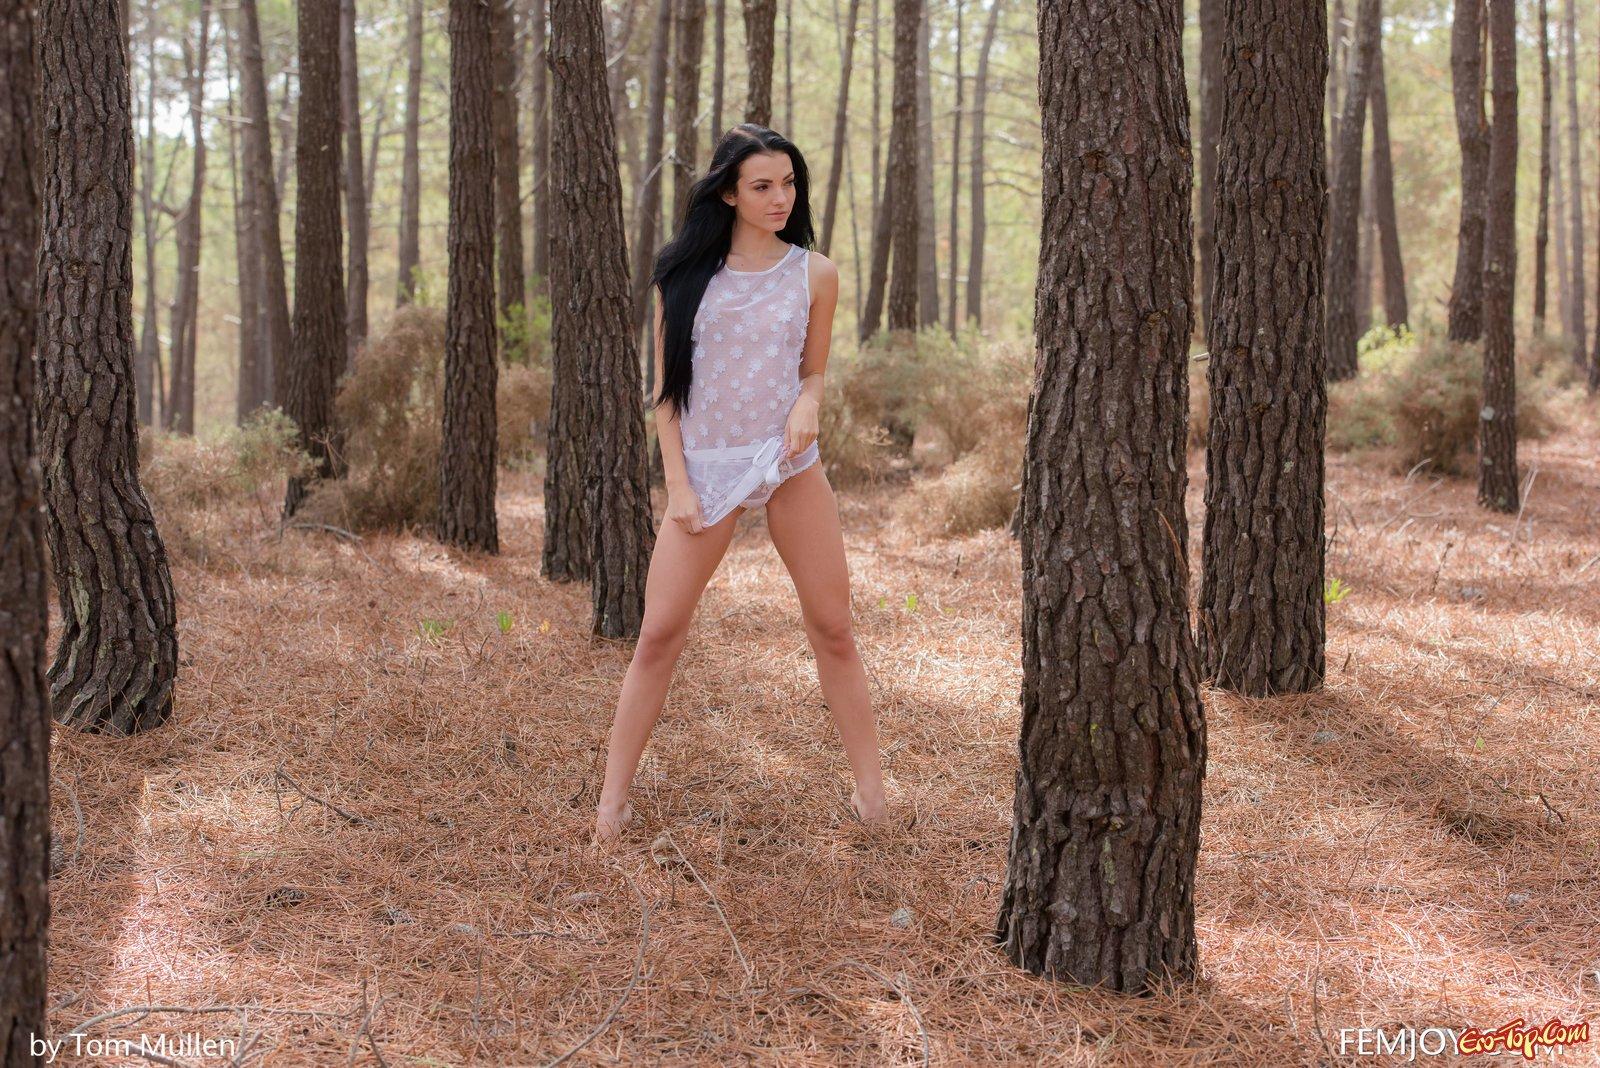 Симпатичная голая брюнетка в лесу